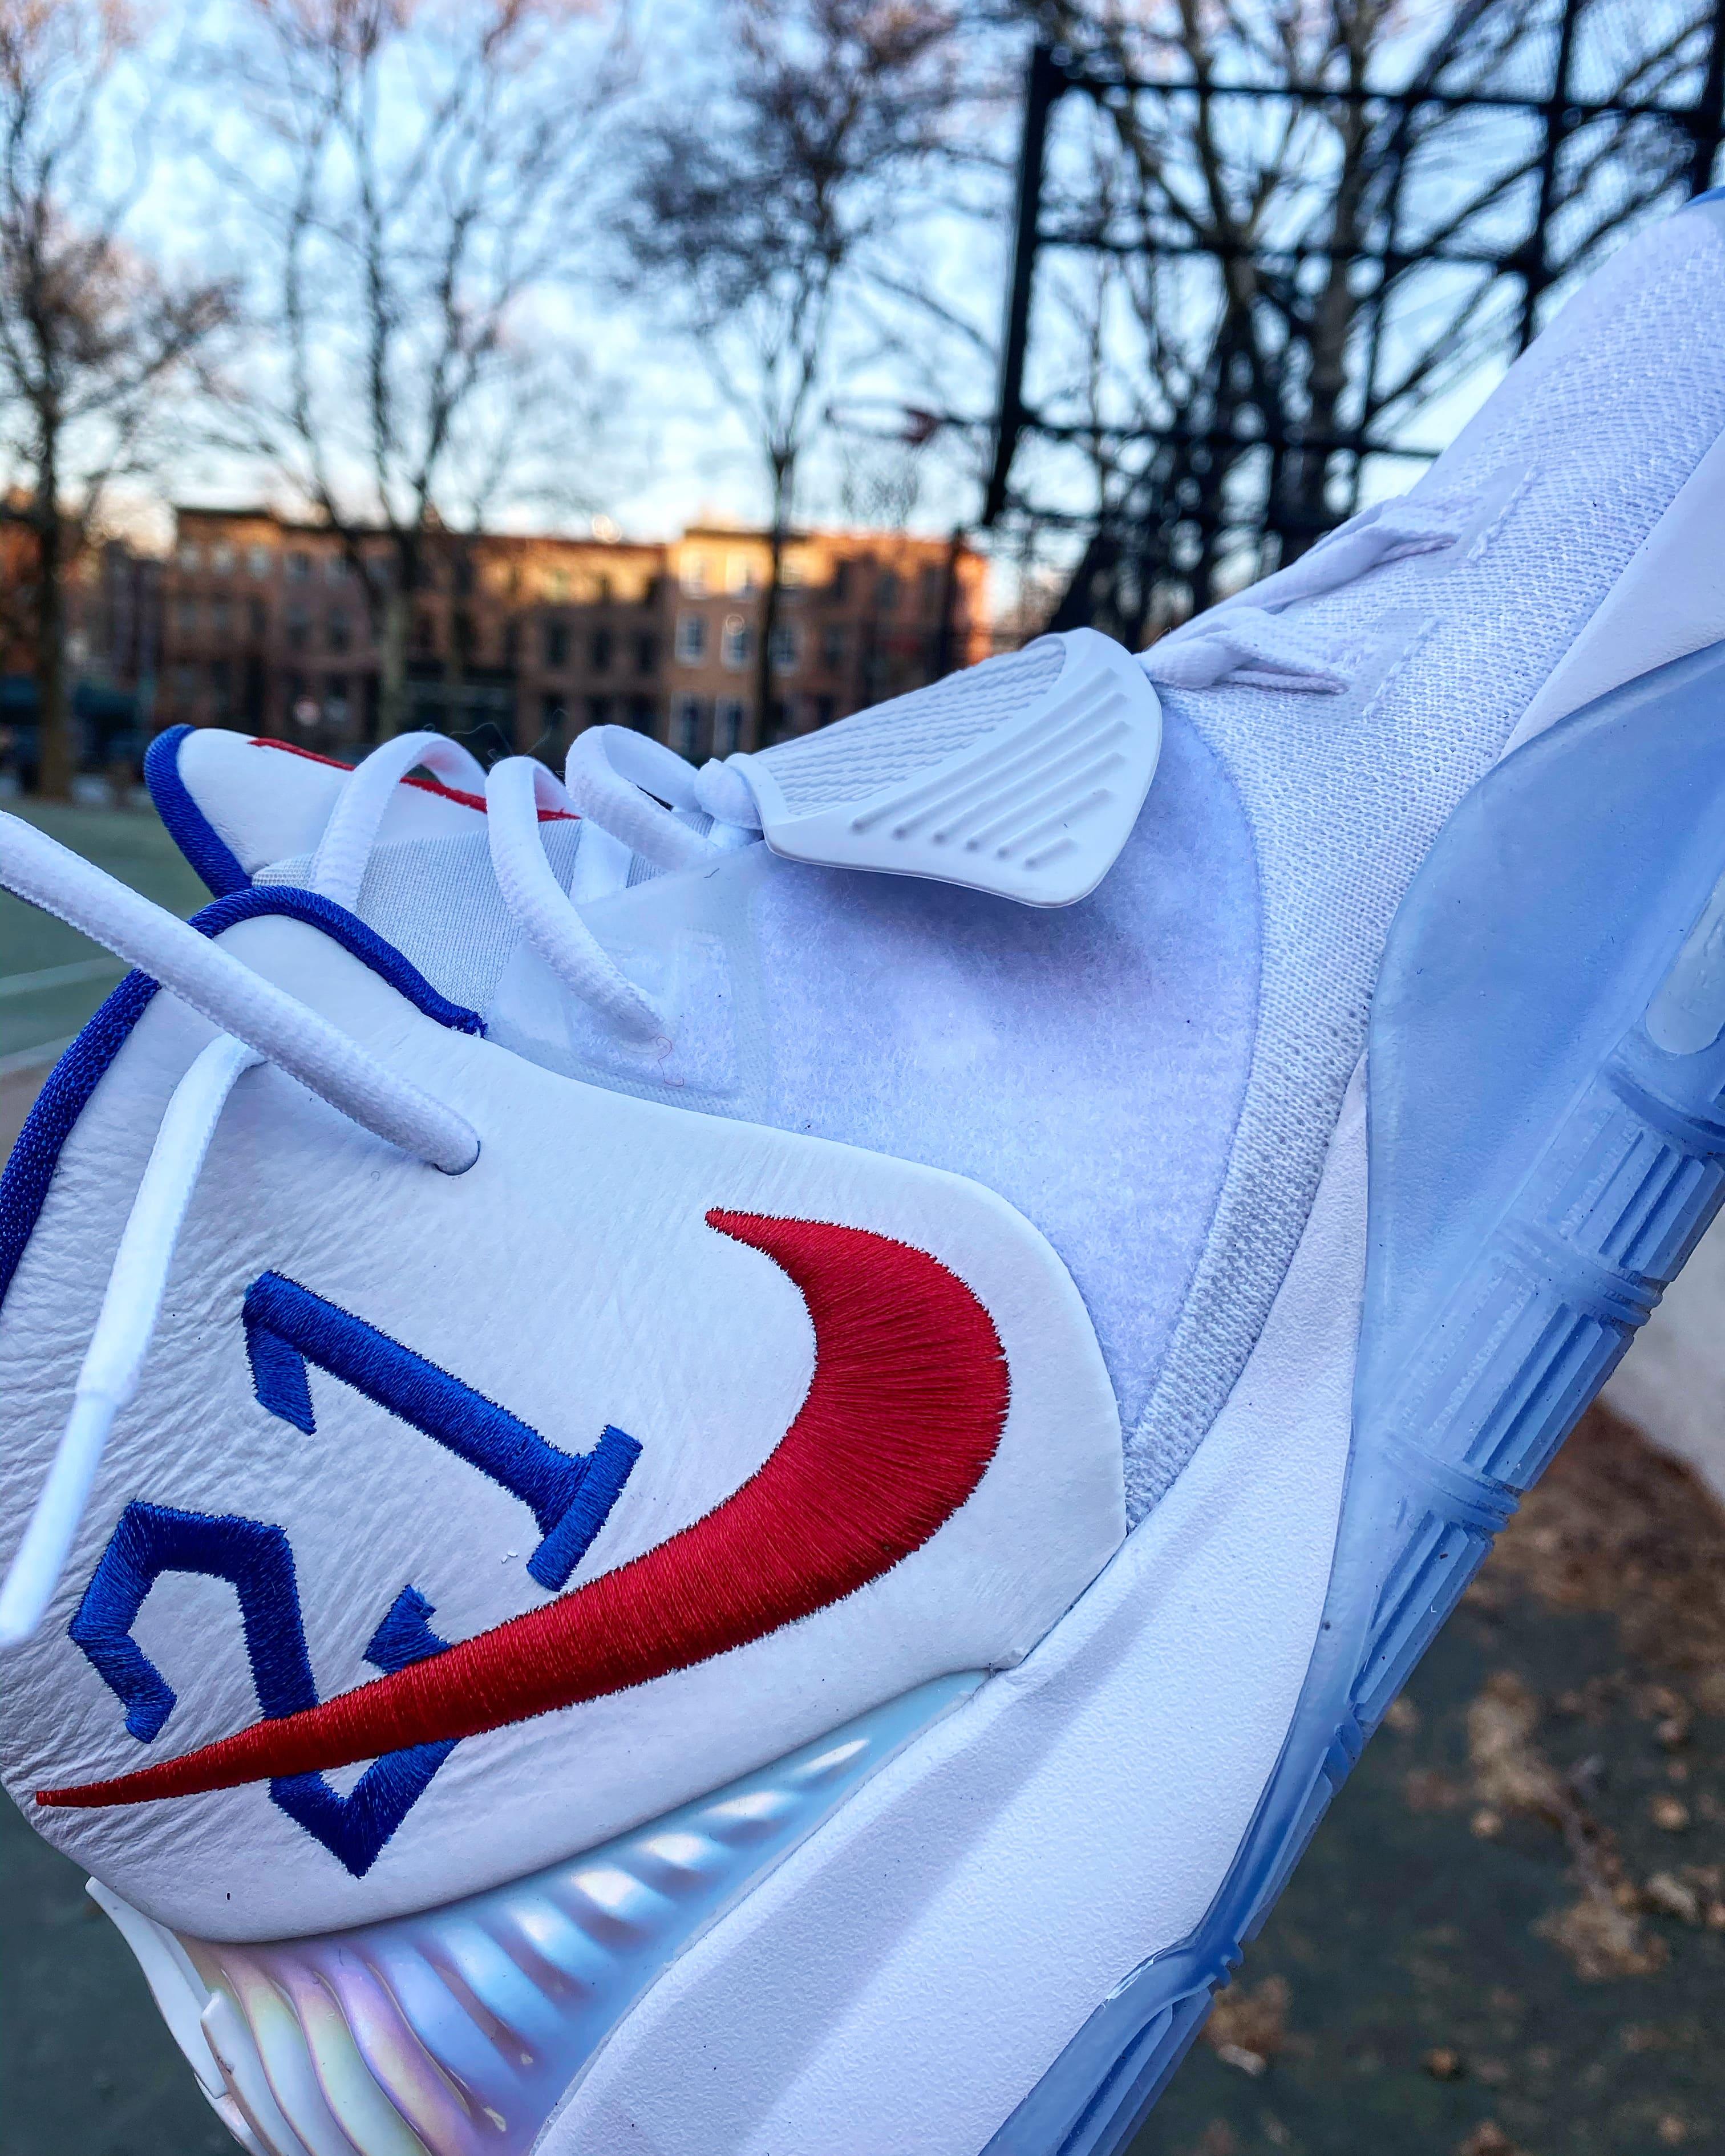 Nike iD Kyrie 6 x Full Court 21 - FC21